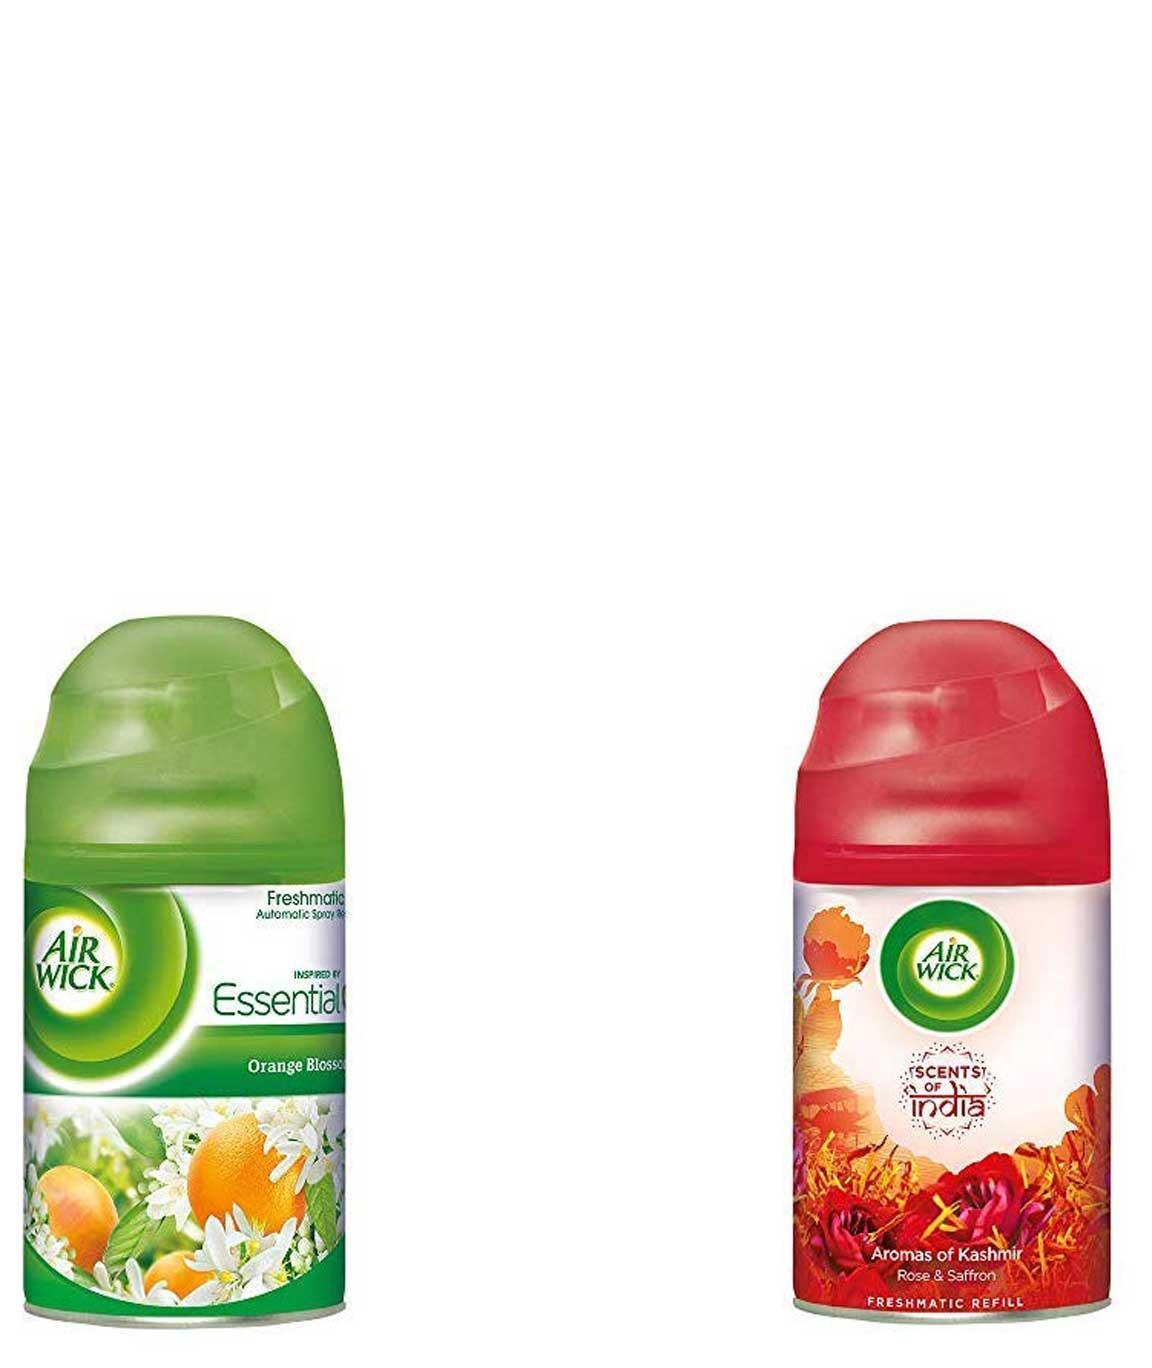 Airwick Freshmatic Refill - Orange Blossom - 250 ml & `Scents of India` Freshmatic Air Freshner Refill, Aromas of Kashmir - 250 ml Combo